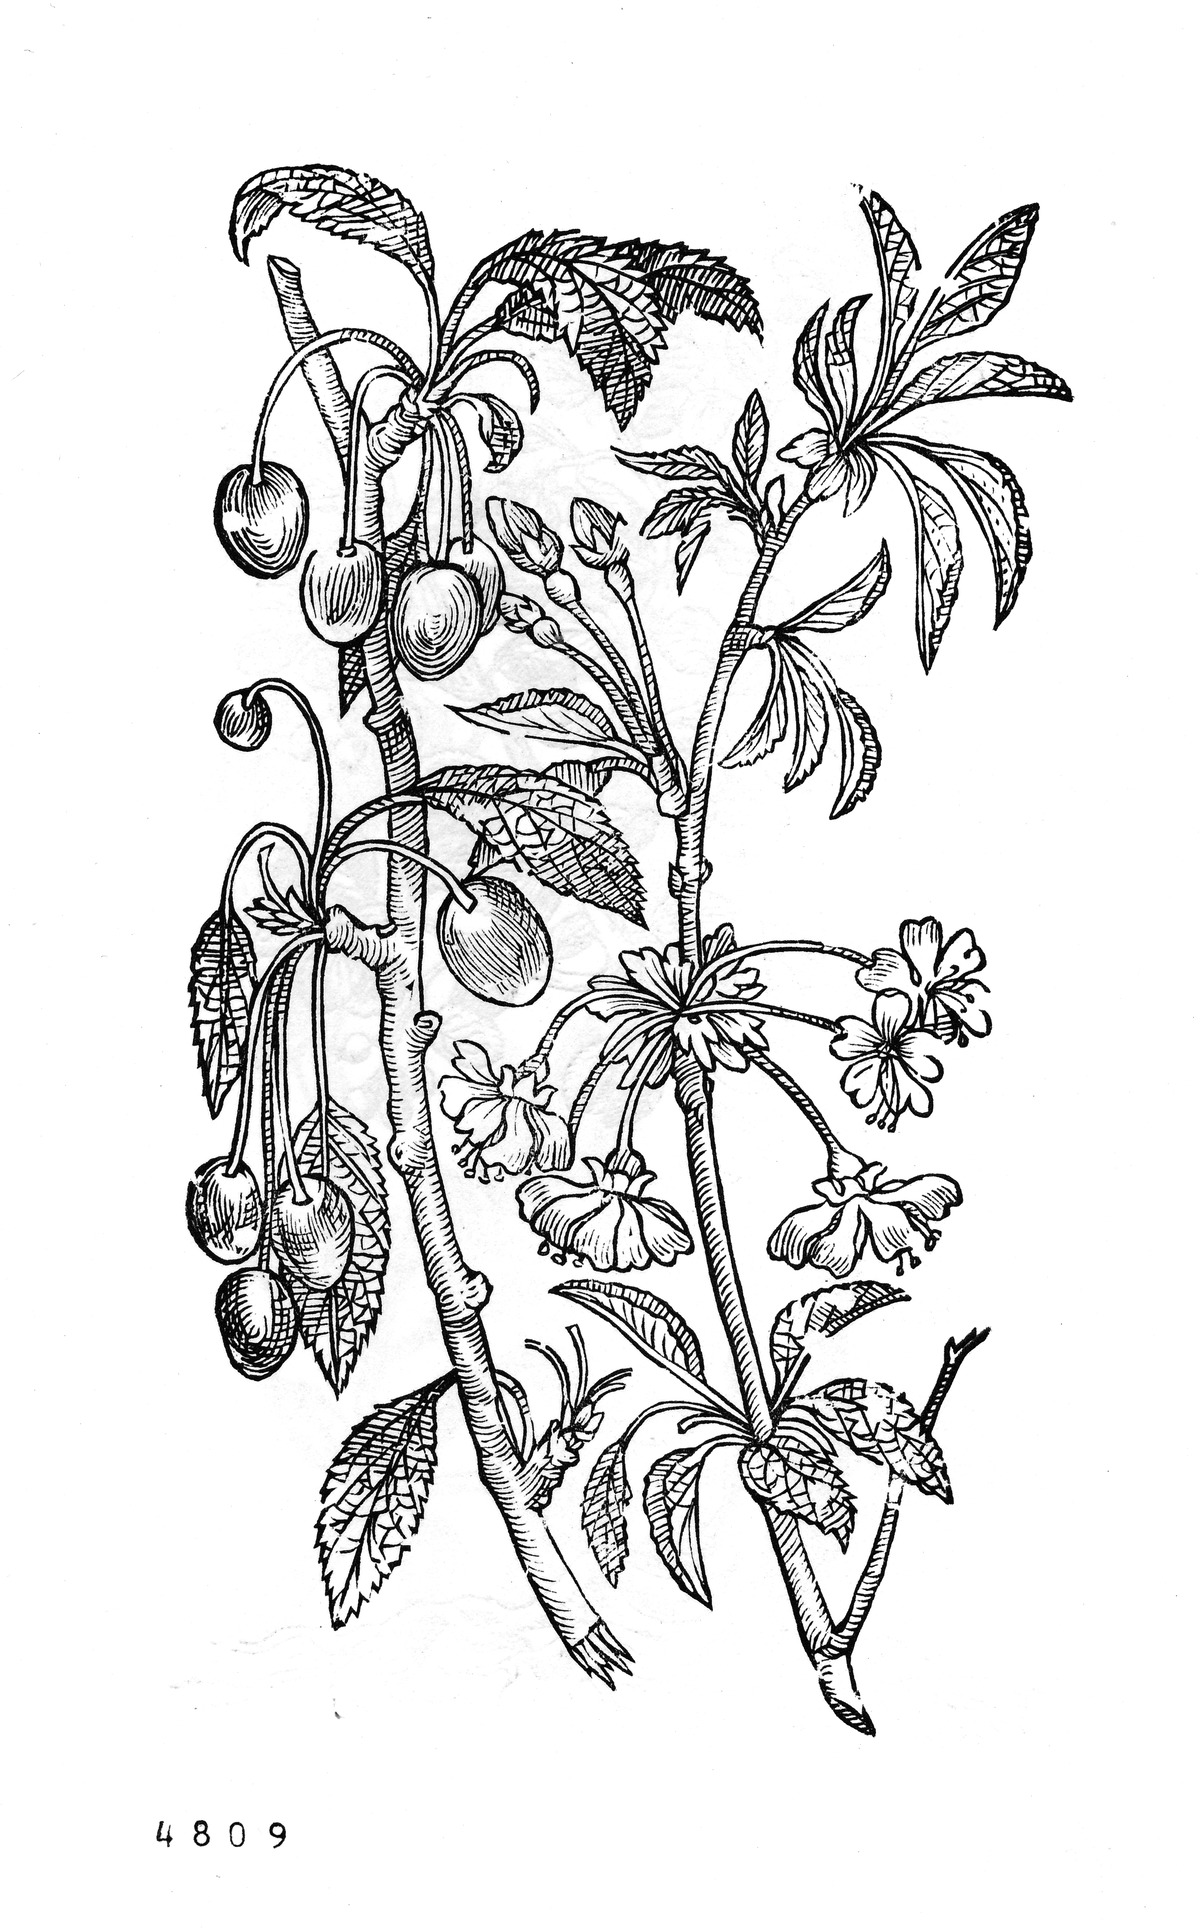 Zoete kers [Prunus avium]